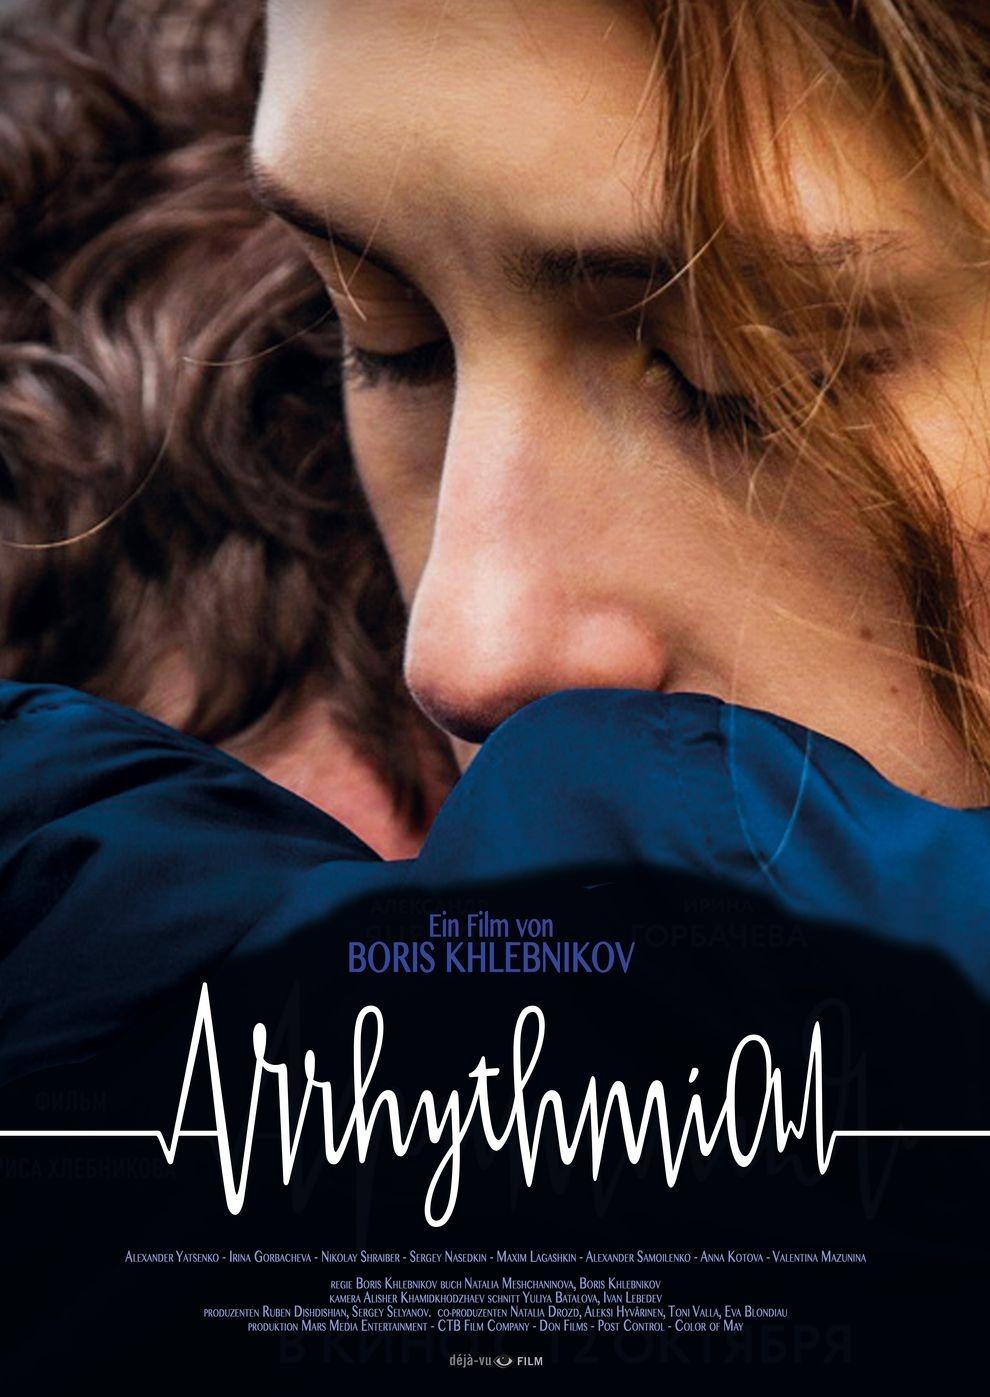 Arrhythmia (Poster)